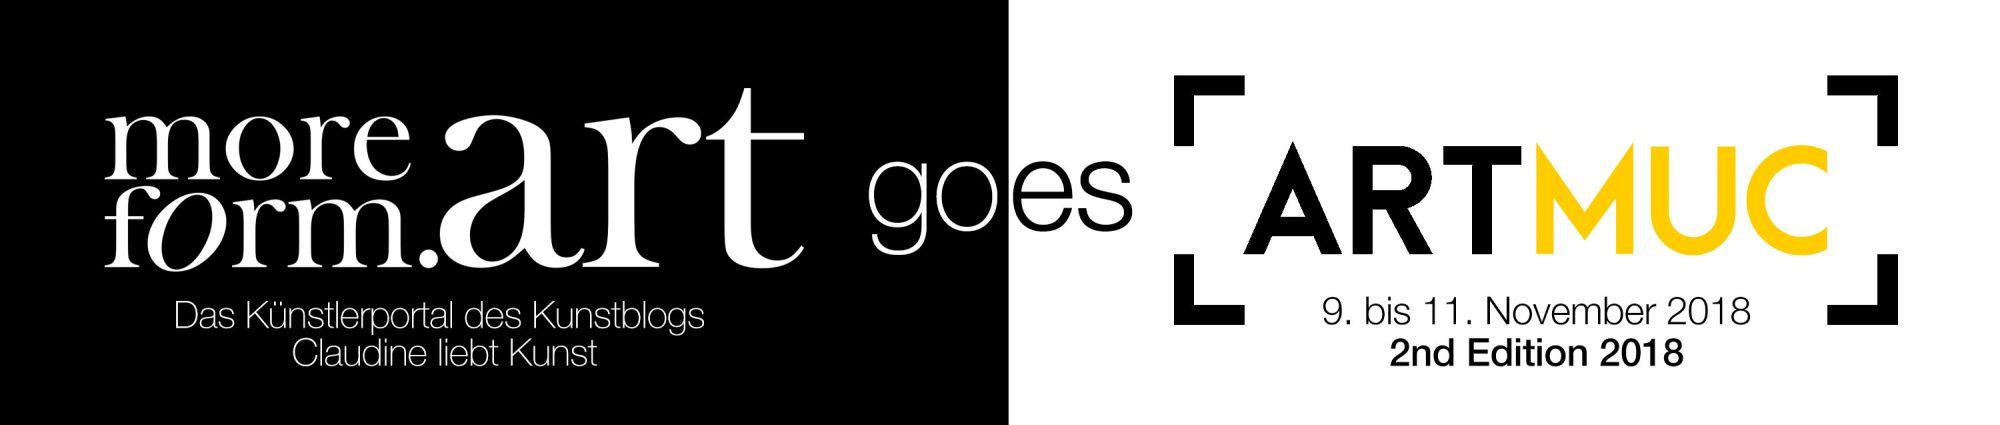 moreform goes artmuc 2nd_webseite neu